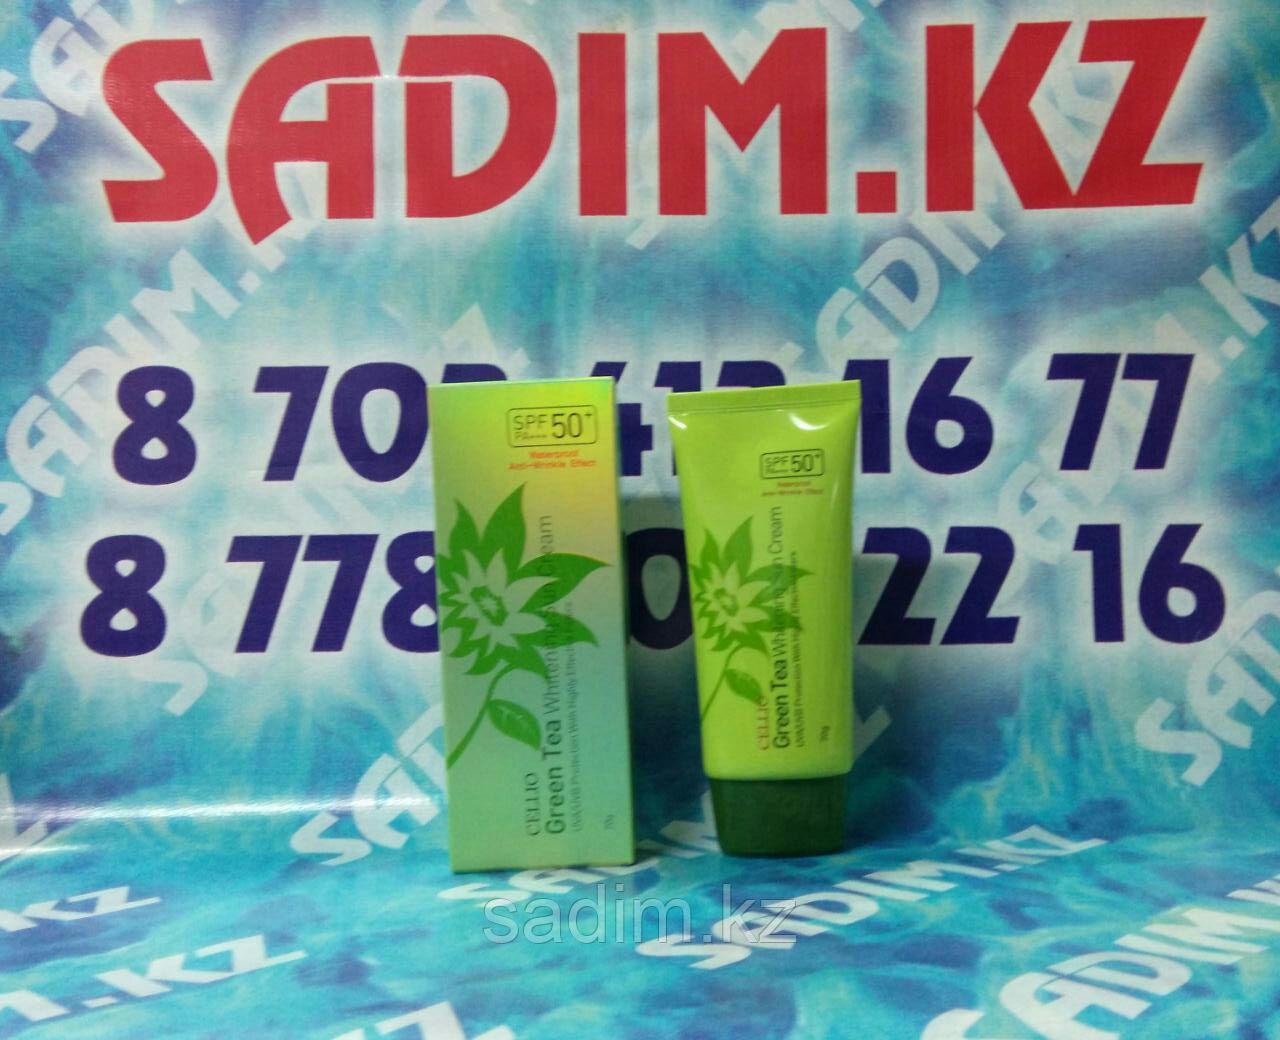 Cellio Green Tea Whitening Sun Cream SPF50+/PA+++ - Солнцезащитный крем на основе зеленого чая